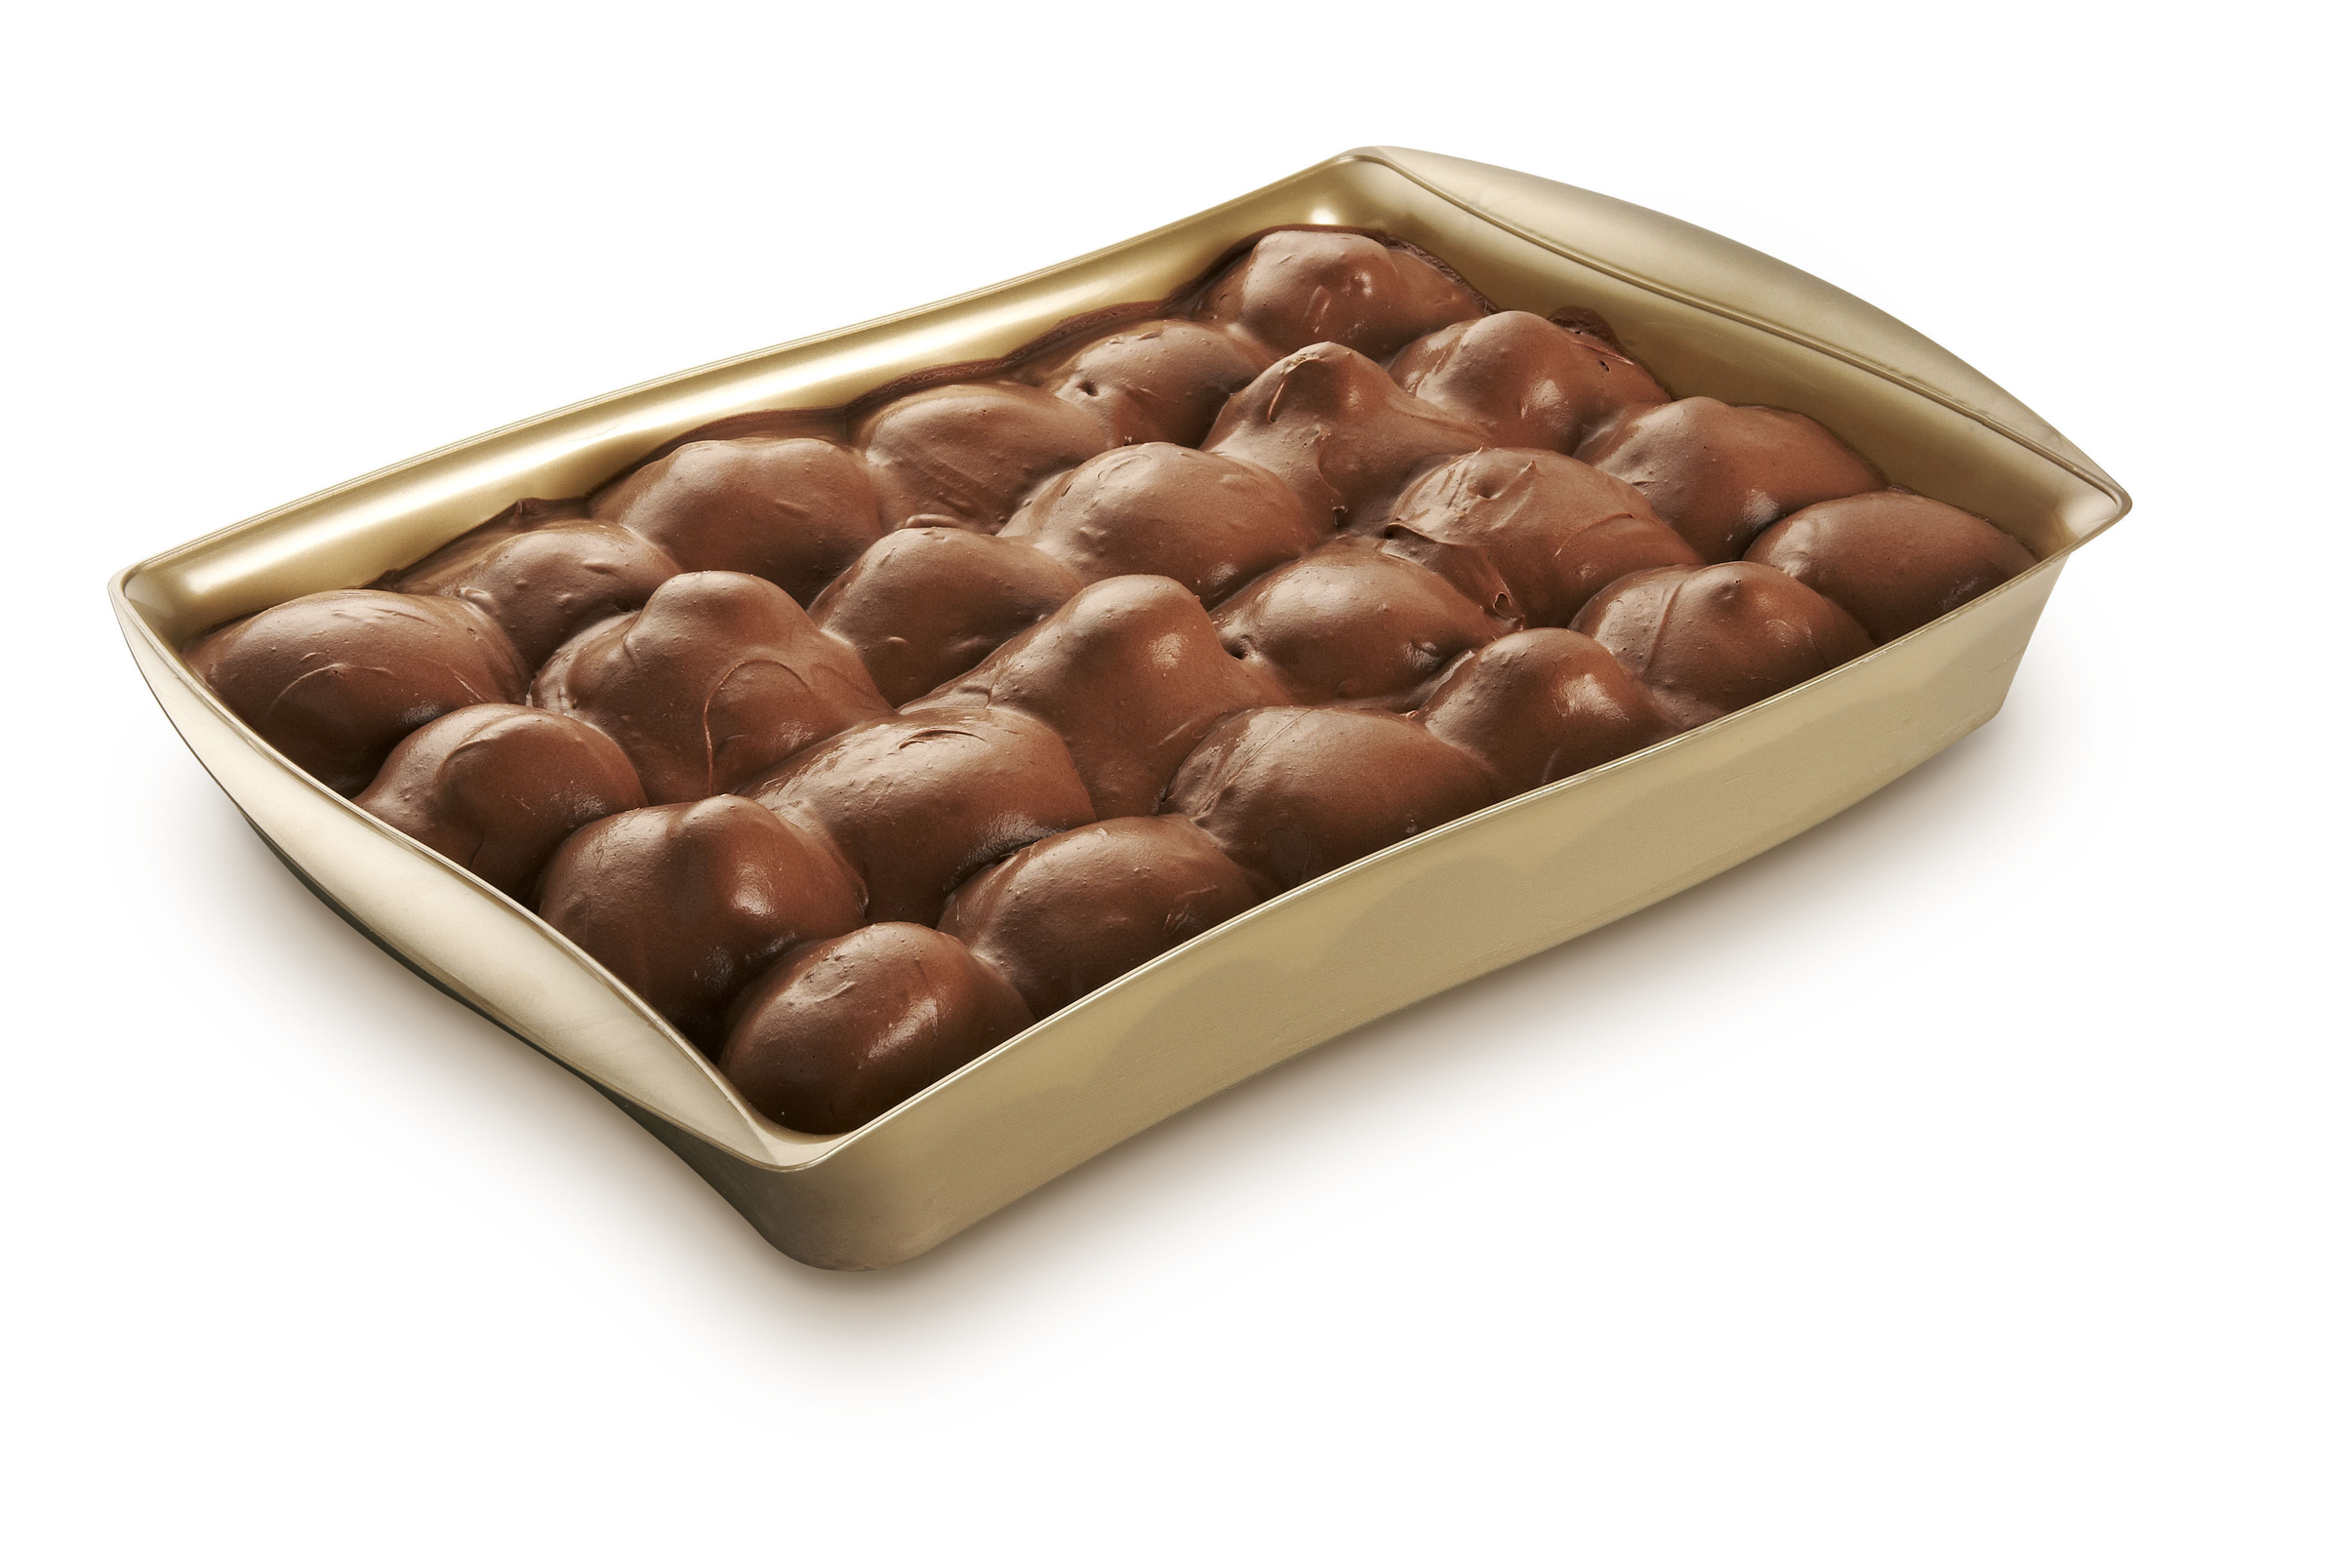 Profitterole al cacao in vaschetta – Bassa Risoluzione – PNG a 72 DPI